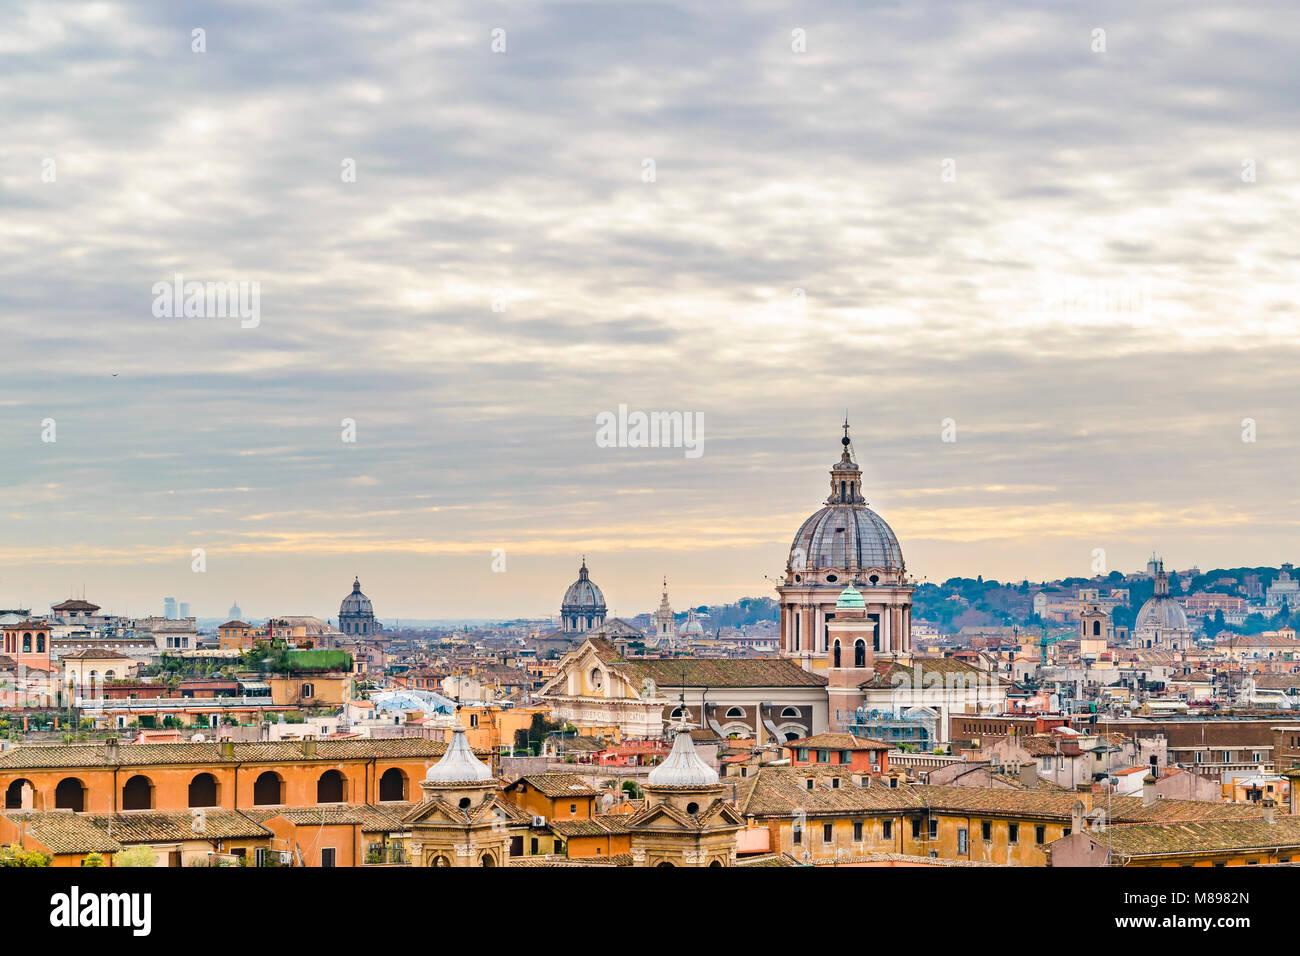 Winter season rome aerial view from monte pincio viewpoint at Villa Borghese - Stock Image